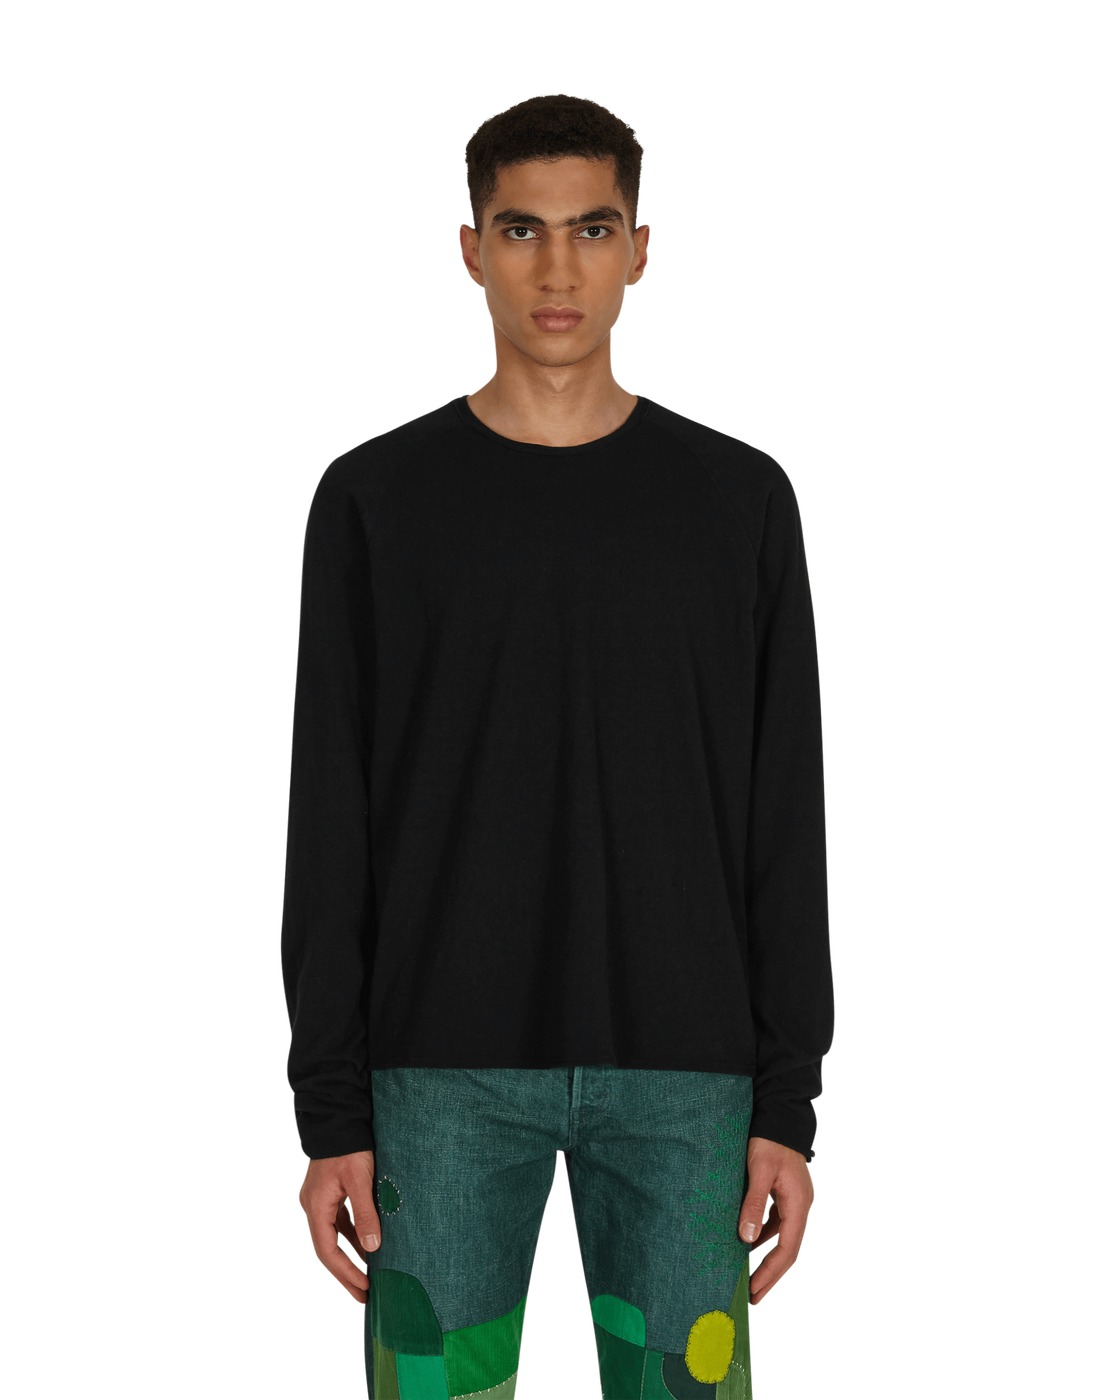 Kapital Jersey X Gauze Jersey Chef Smilie Patch Longsleeve T Shirt Black